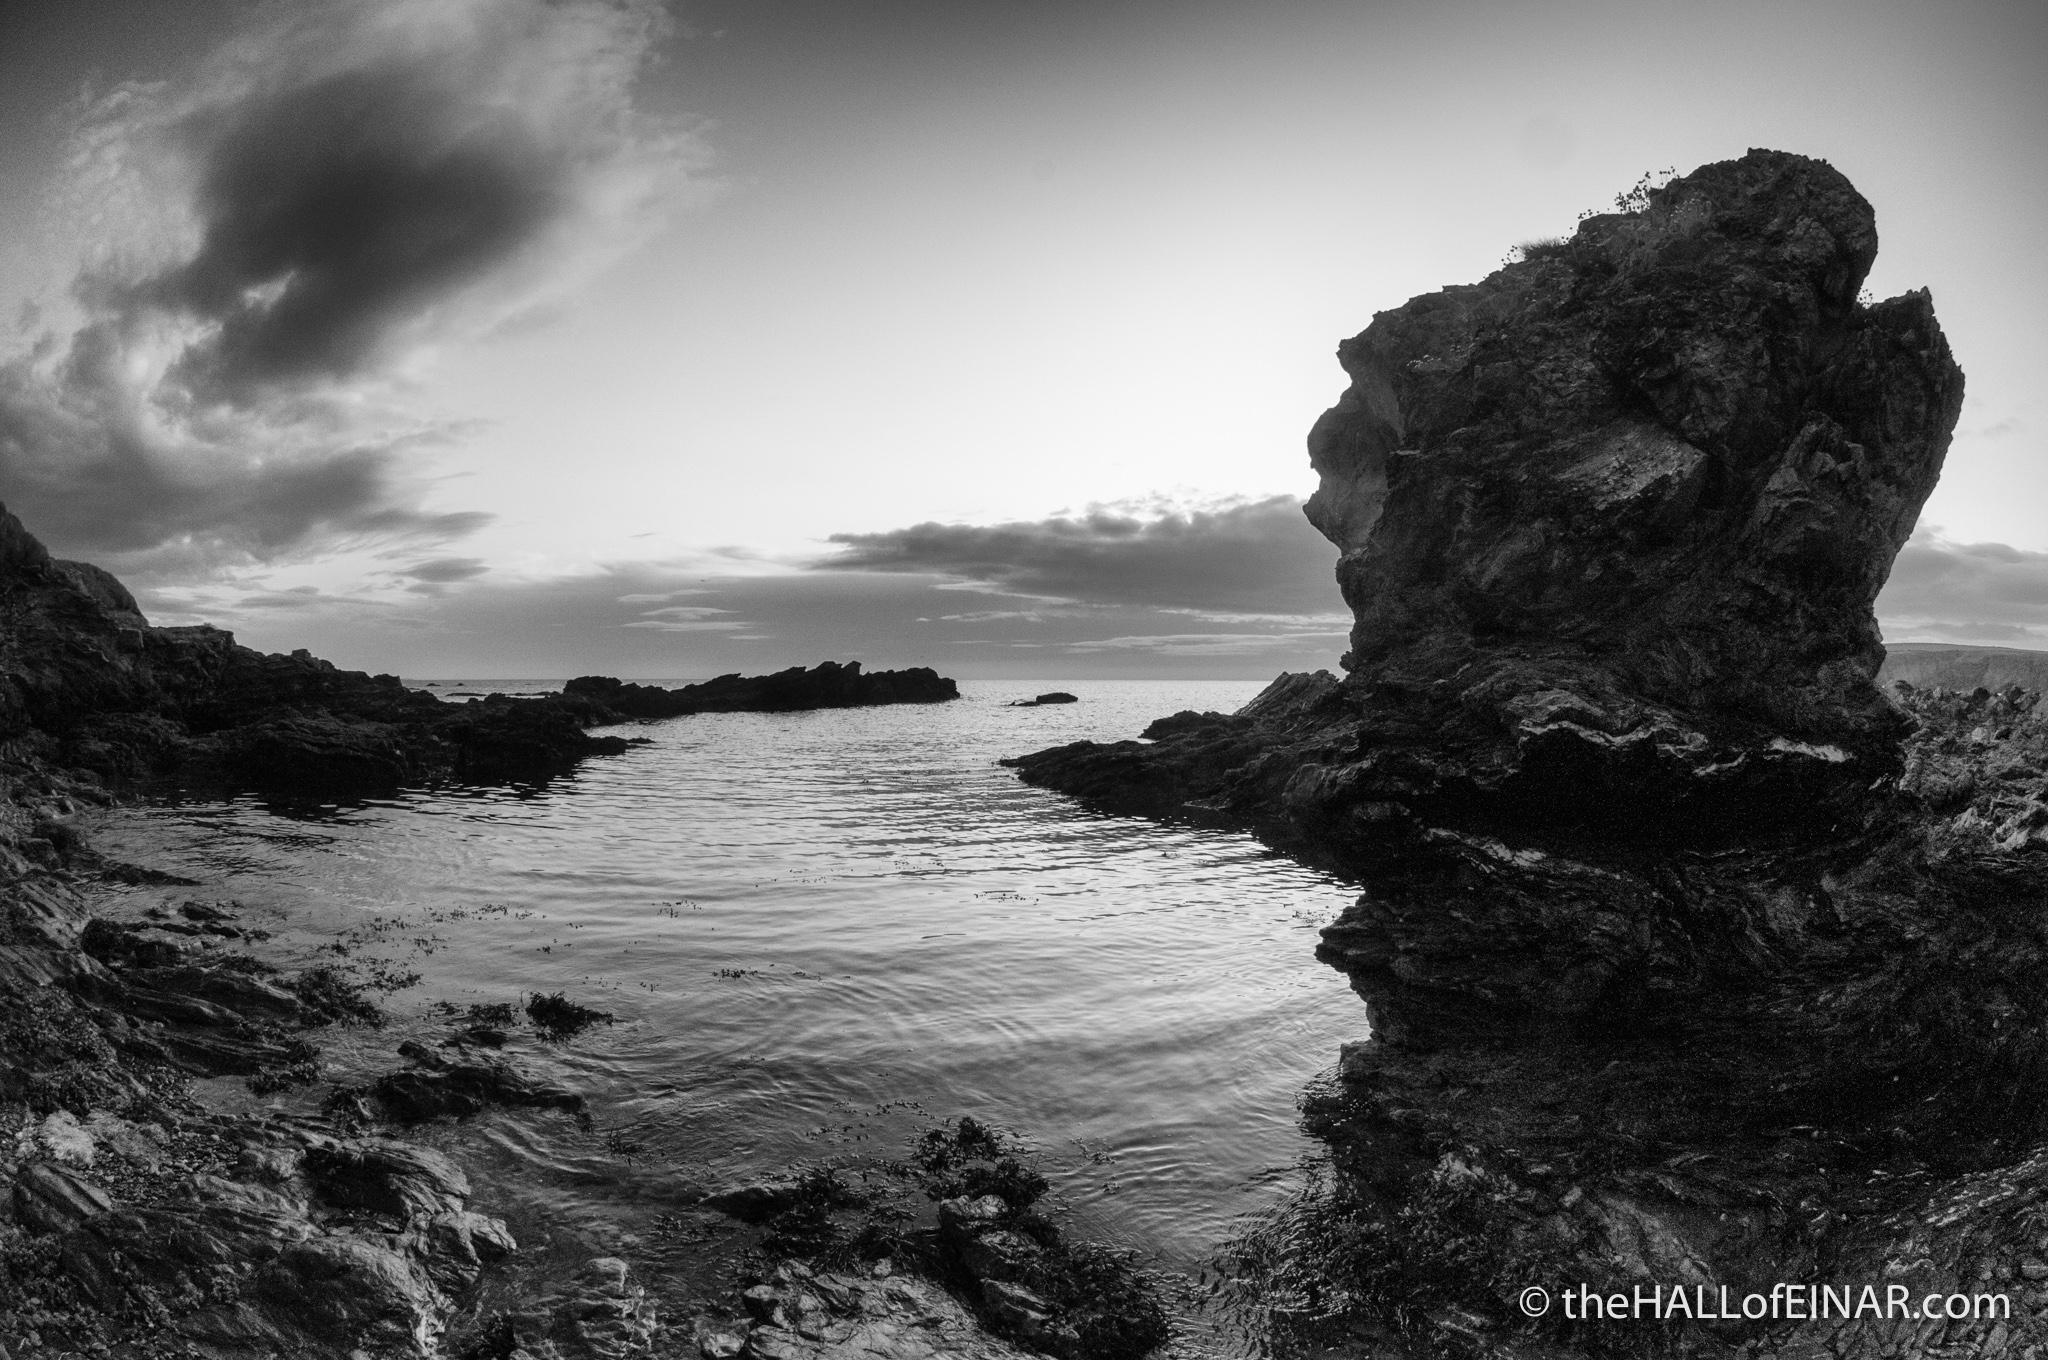 Miniature rock stack - photograph (c) 2016 David Bailey (not the)